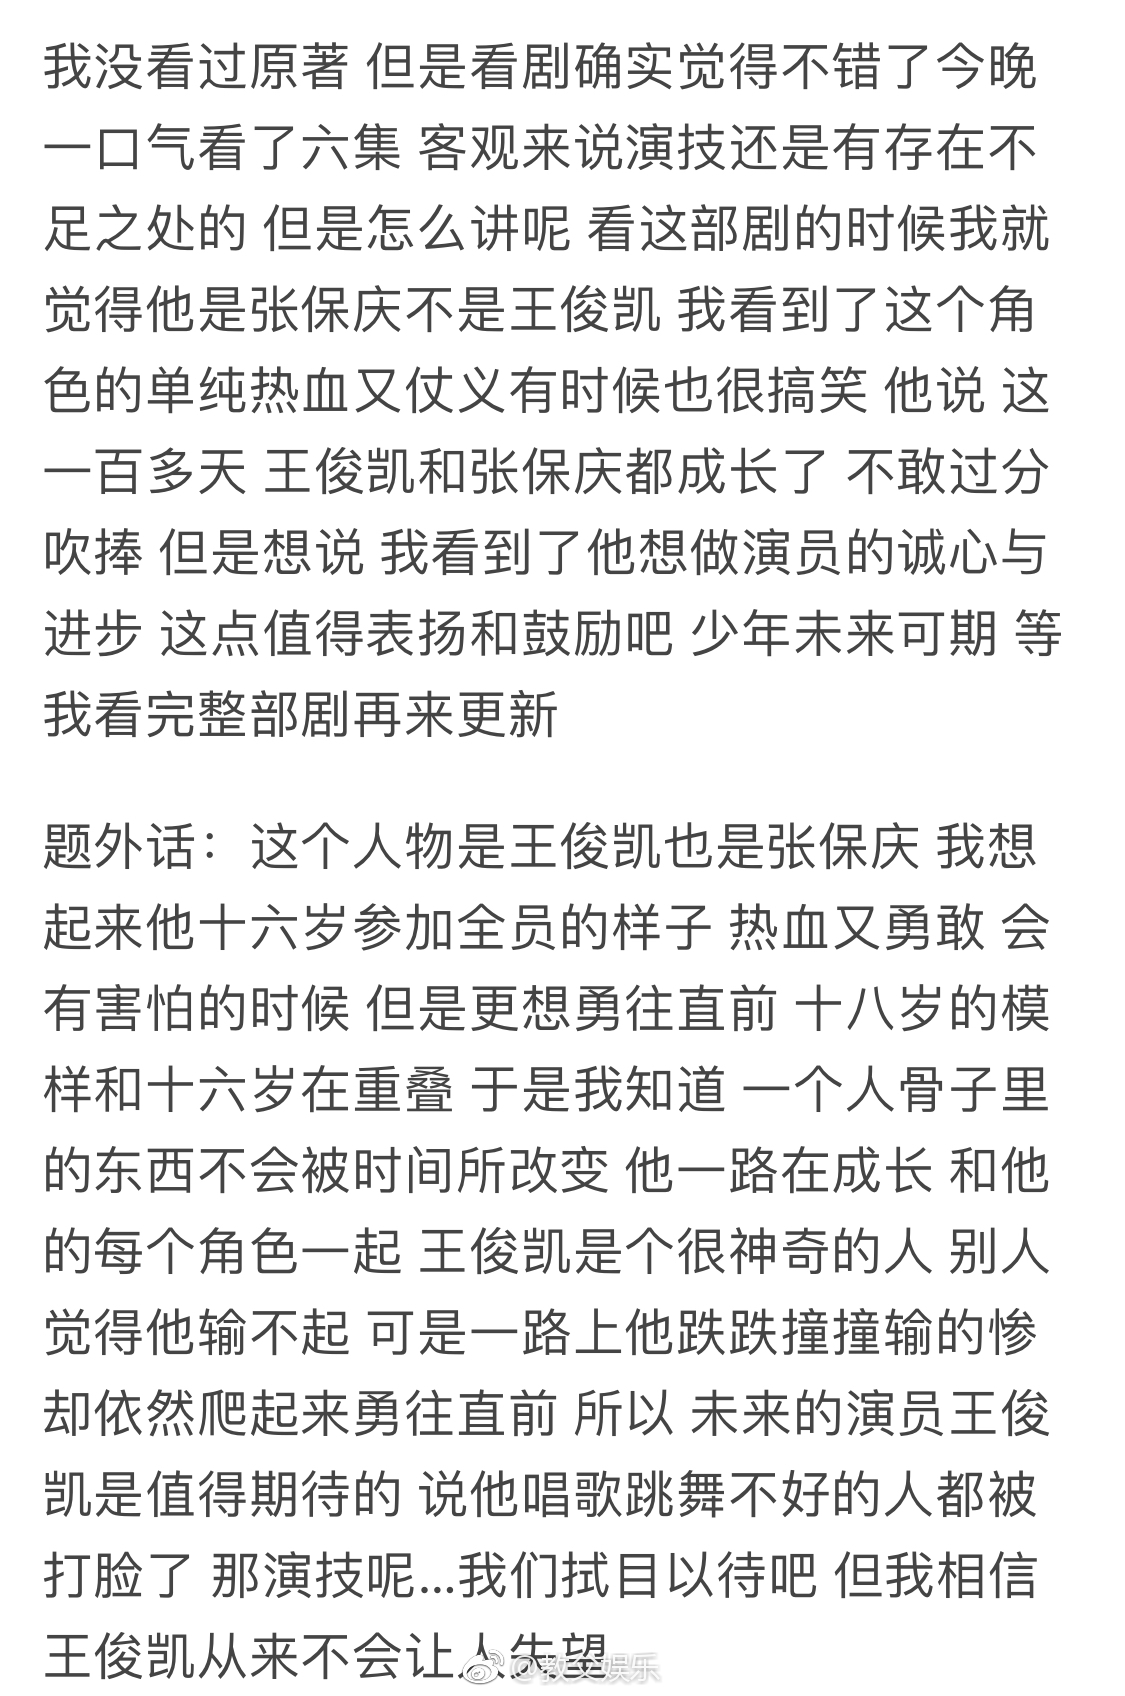 [tfboys][新闻]180903 王俊凯演技获中肯评价,主动降低片酬考虑长远